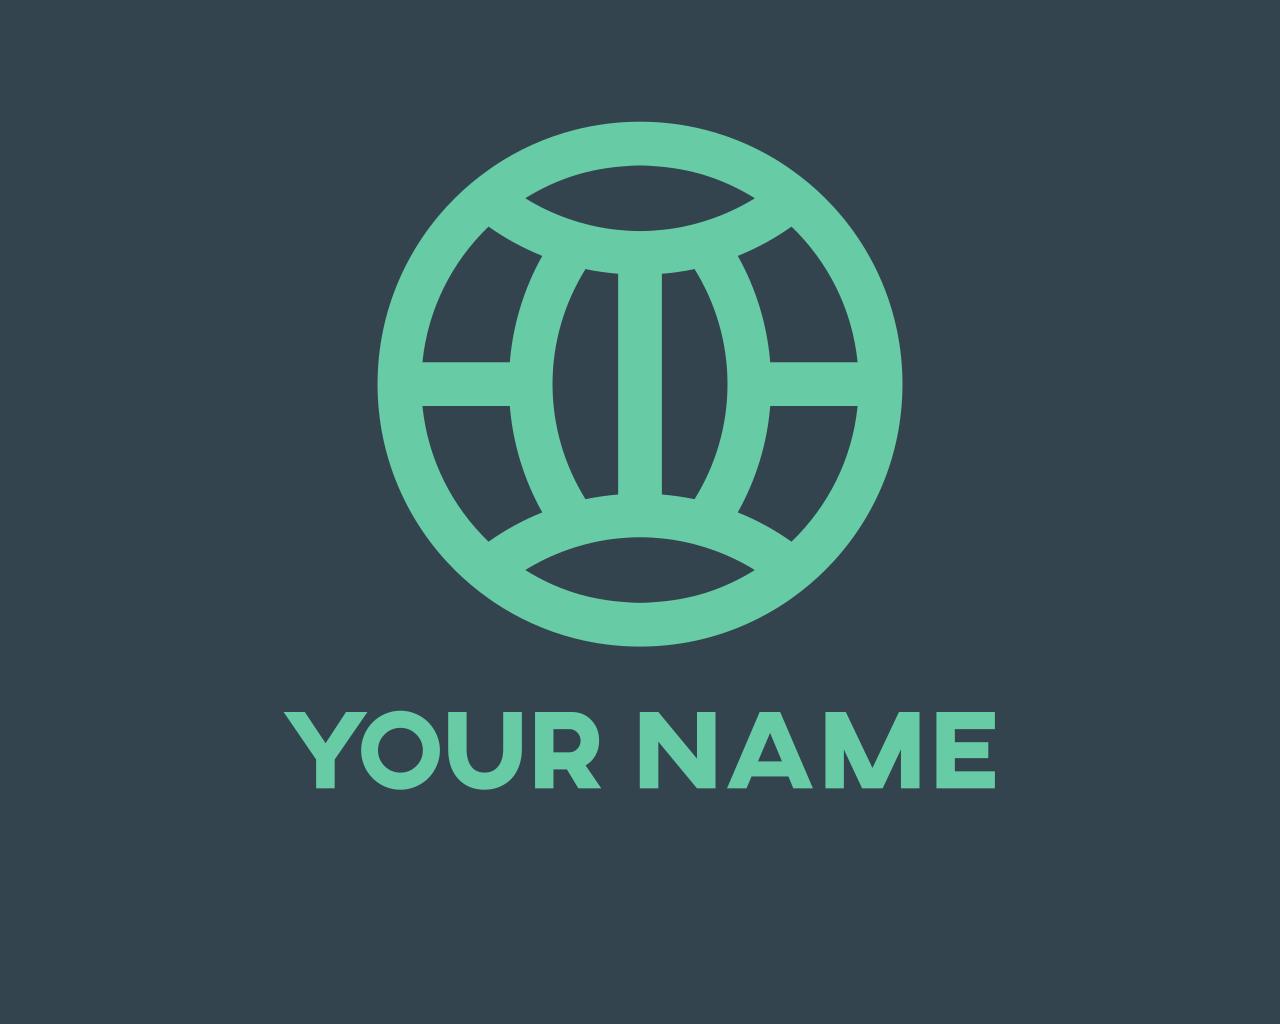 I Will Design Teal Modern Globe Logo